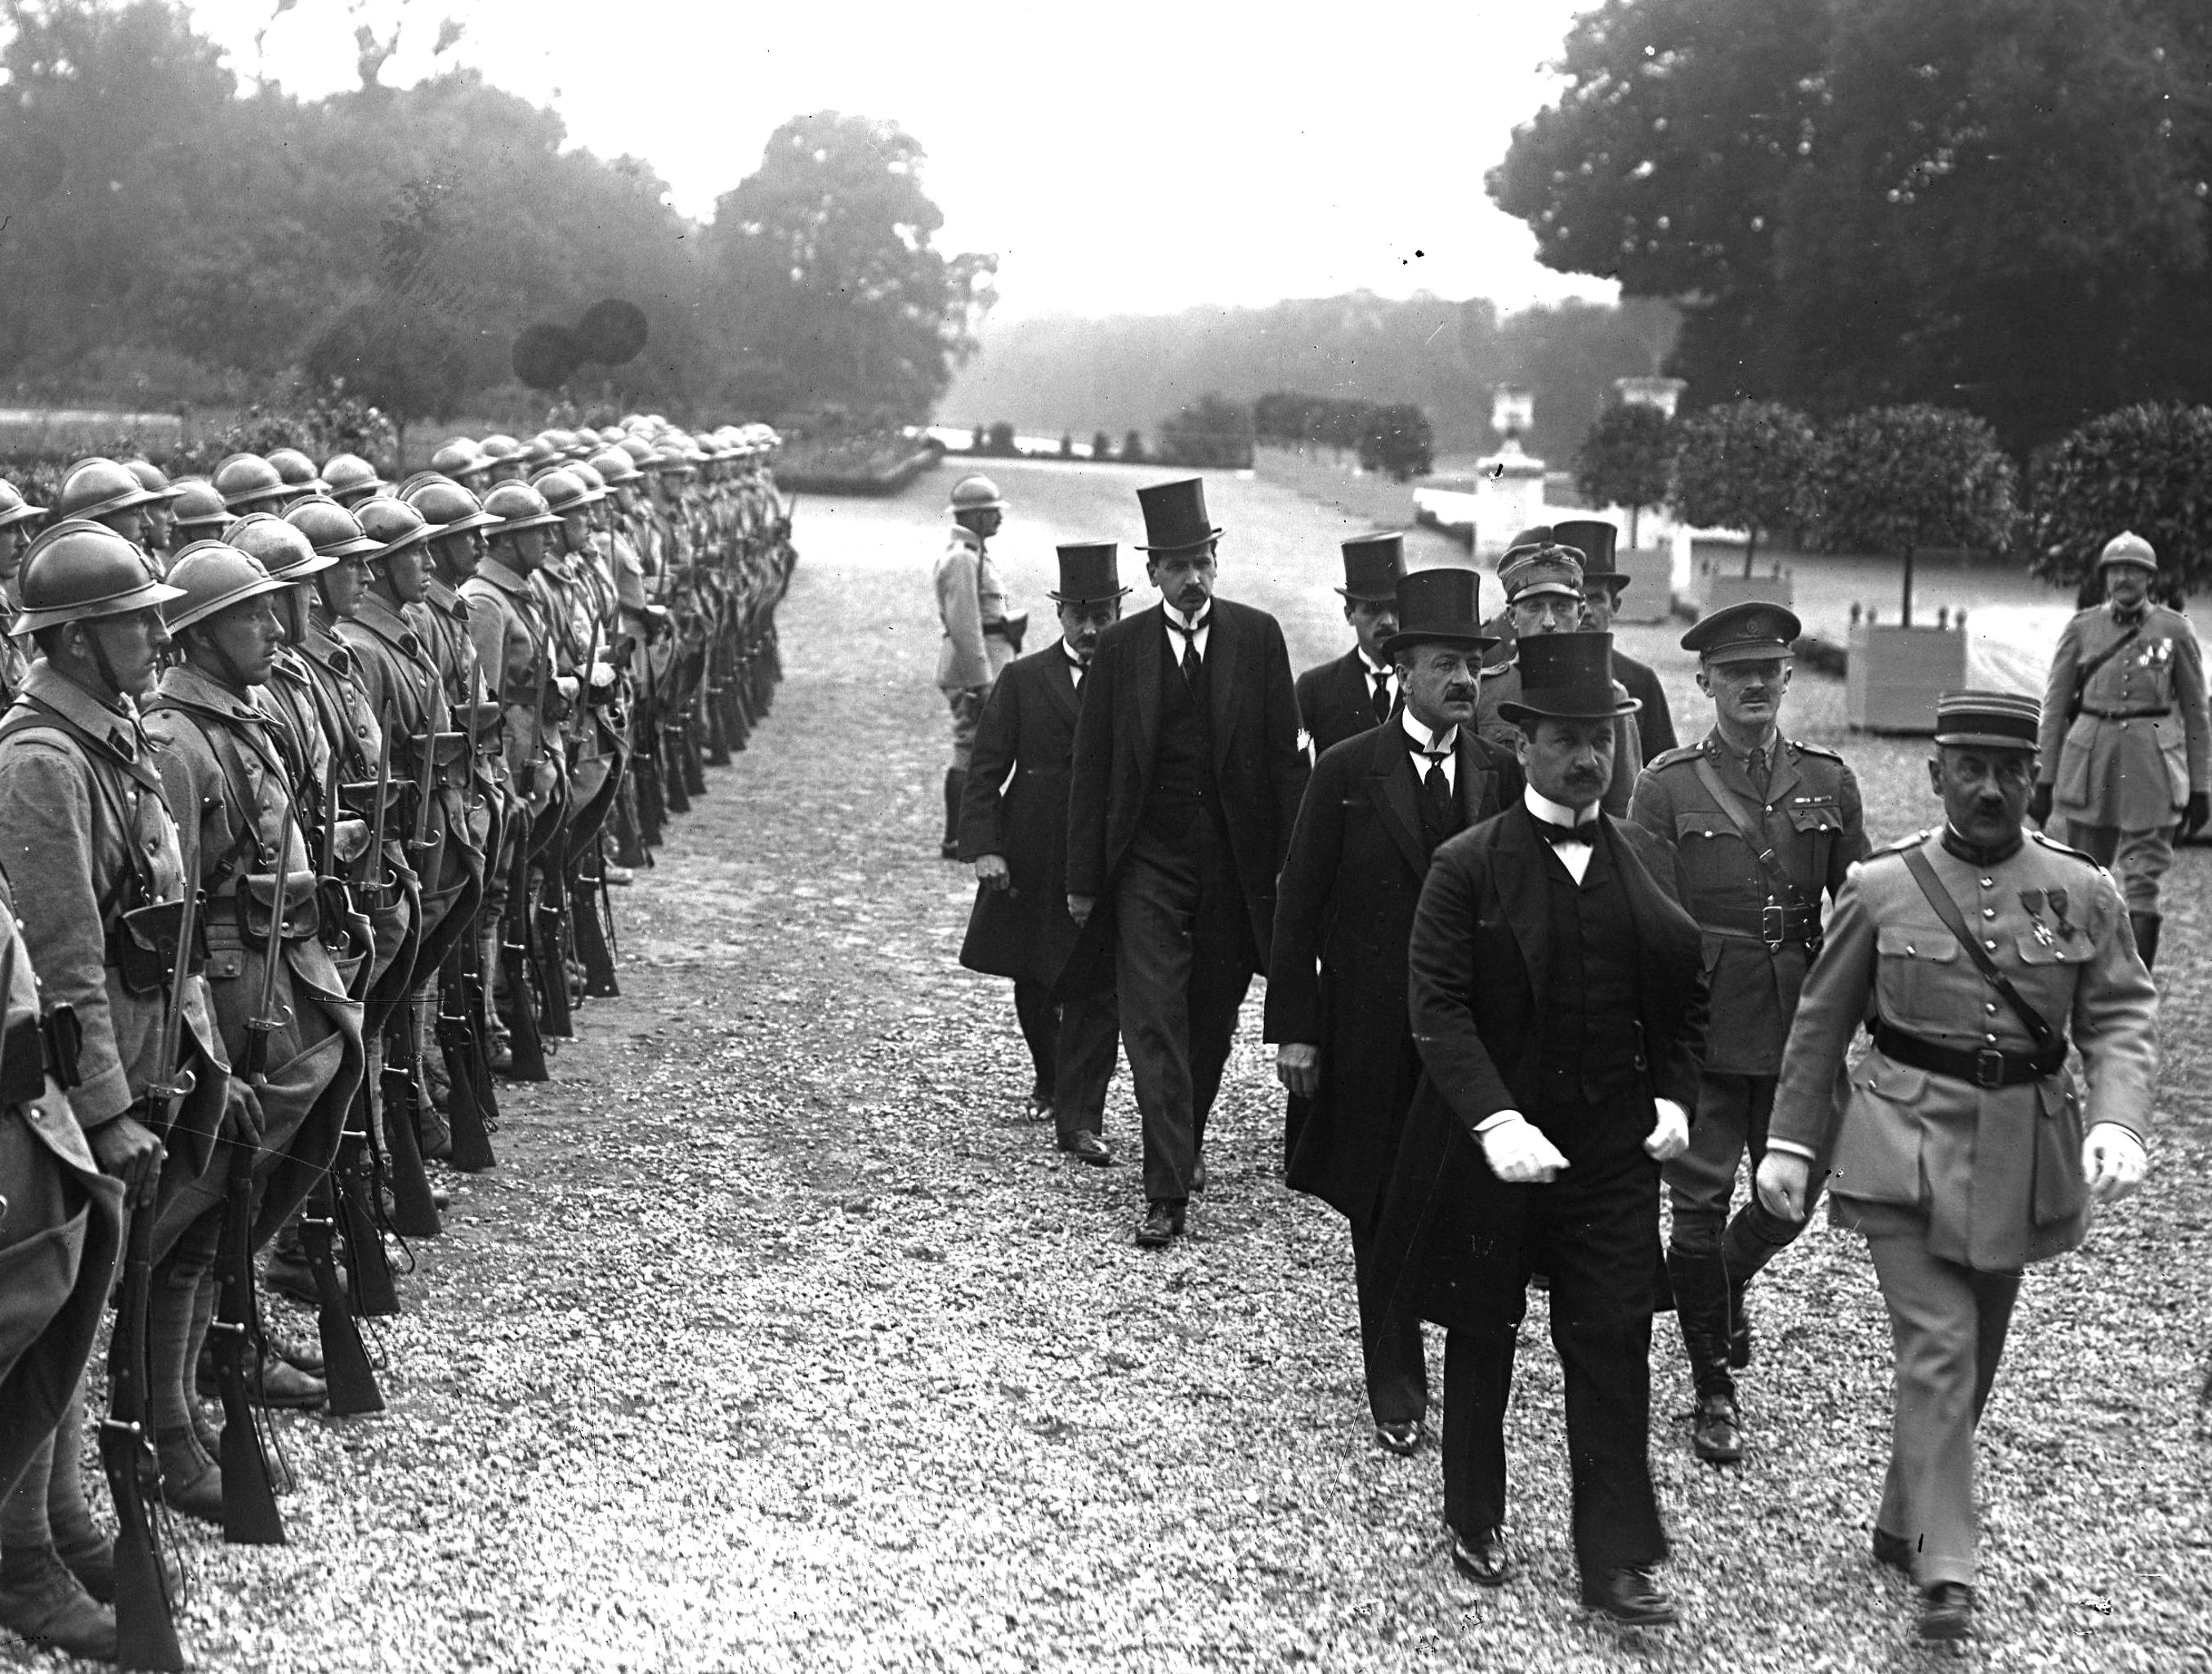 Treaty of Trianon - Wikipedia